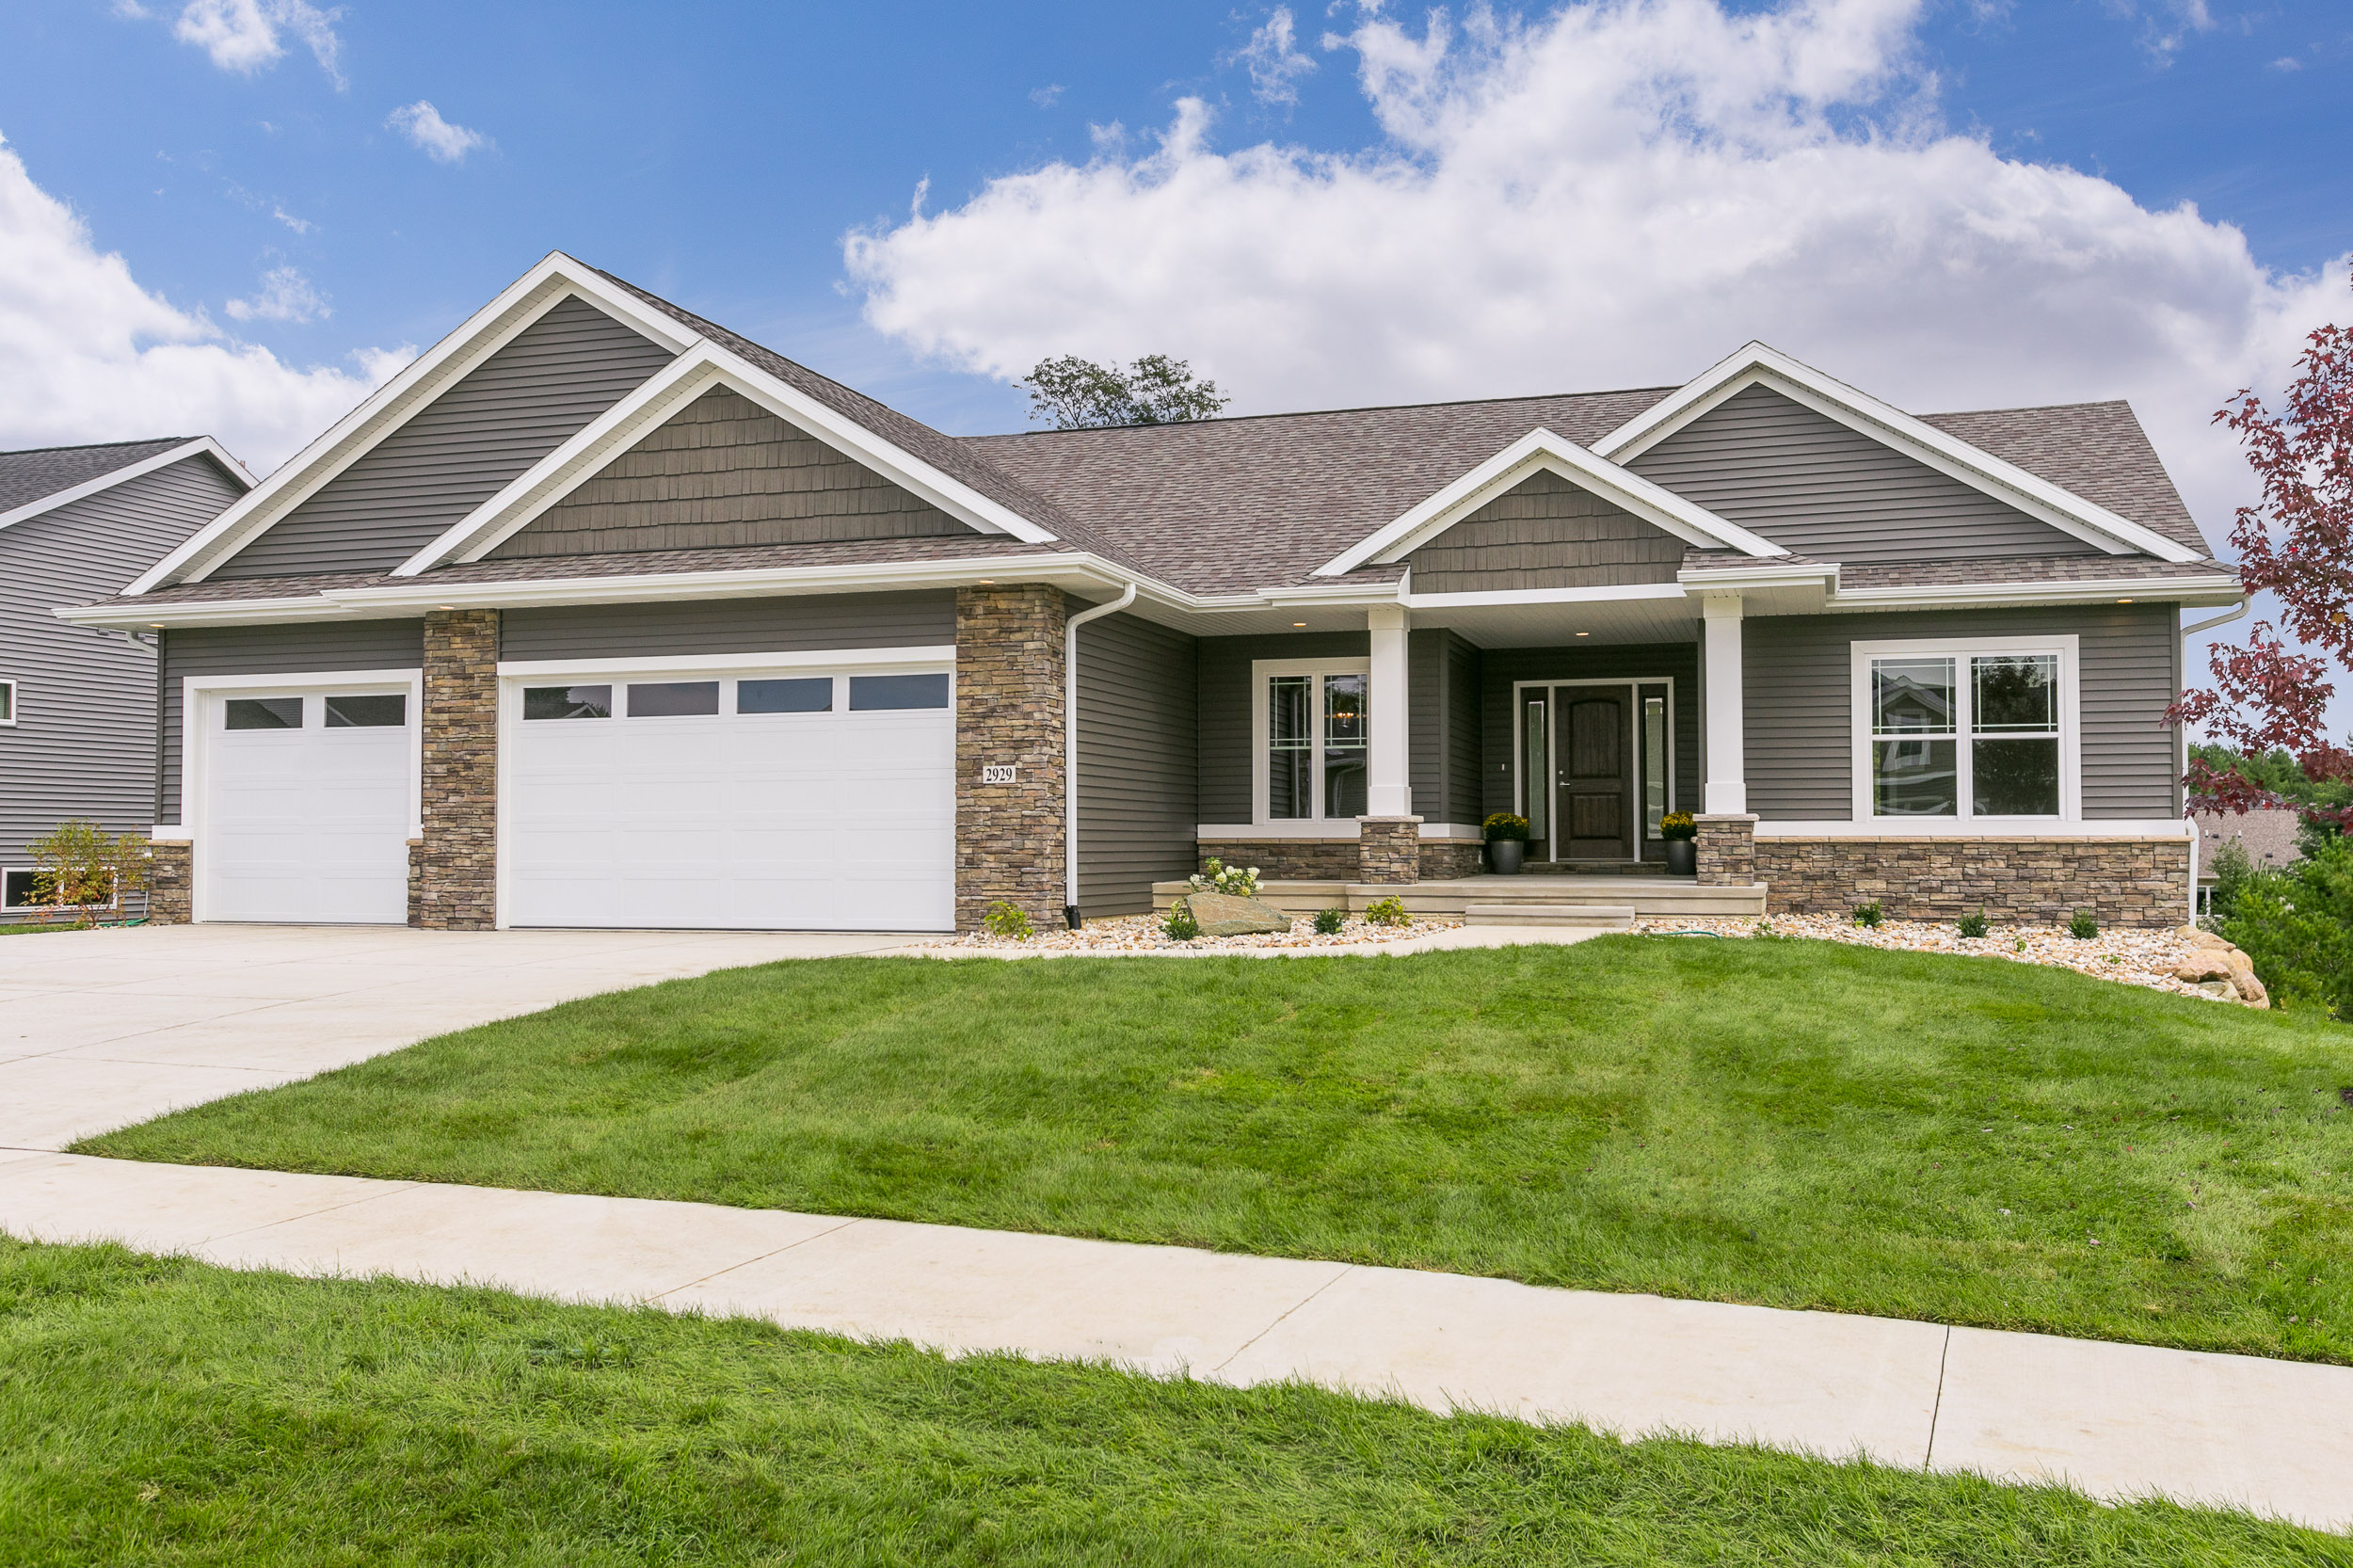 2019 Fall Parade of Homes Entry